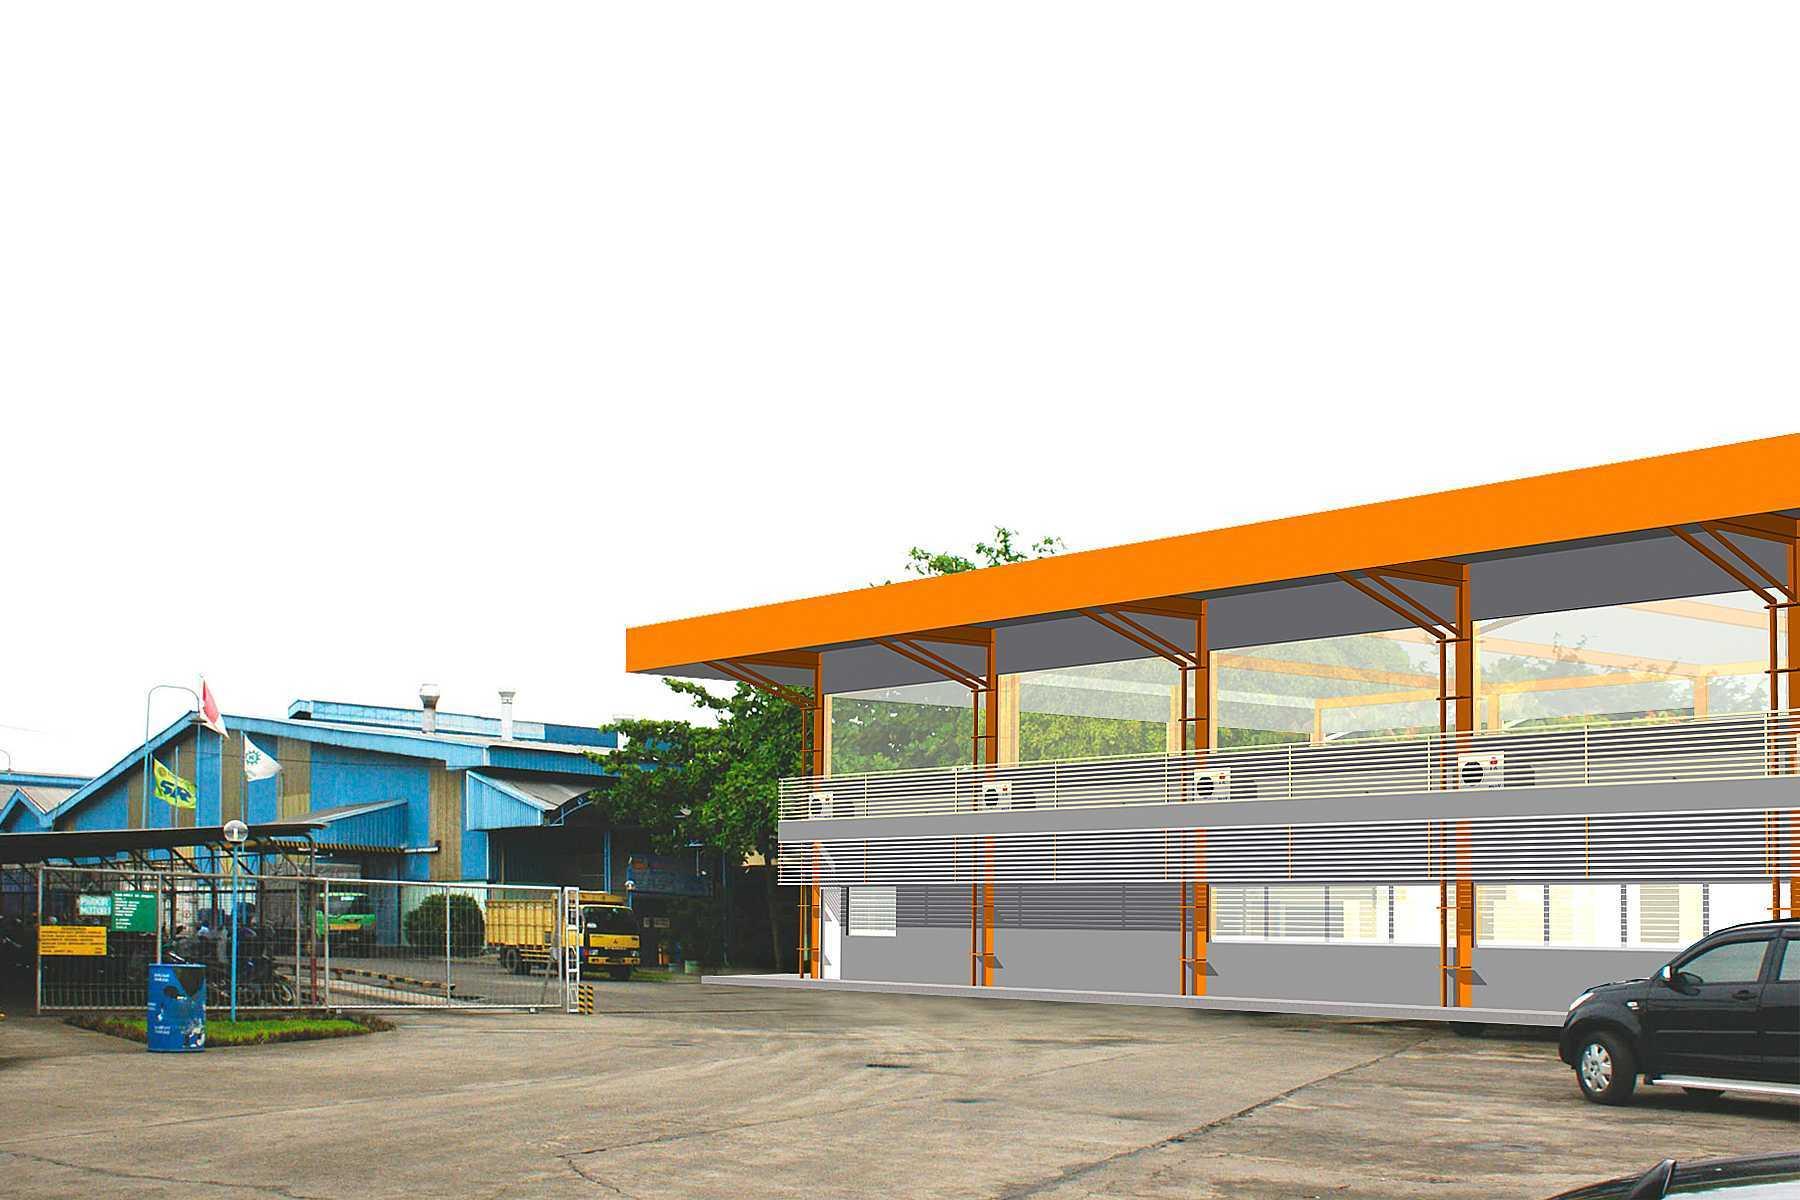 Pt.  Atelier Una Indonesia Cometa Office  Bitung, Kota Bitung, Sulawesi Utara, Indonesia Bitung, Kota Bitung, Sulawesi Utara, Indonesia Pt-Atelier-Una-Indonesia-Cometa-Office-  57927